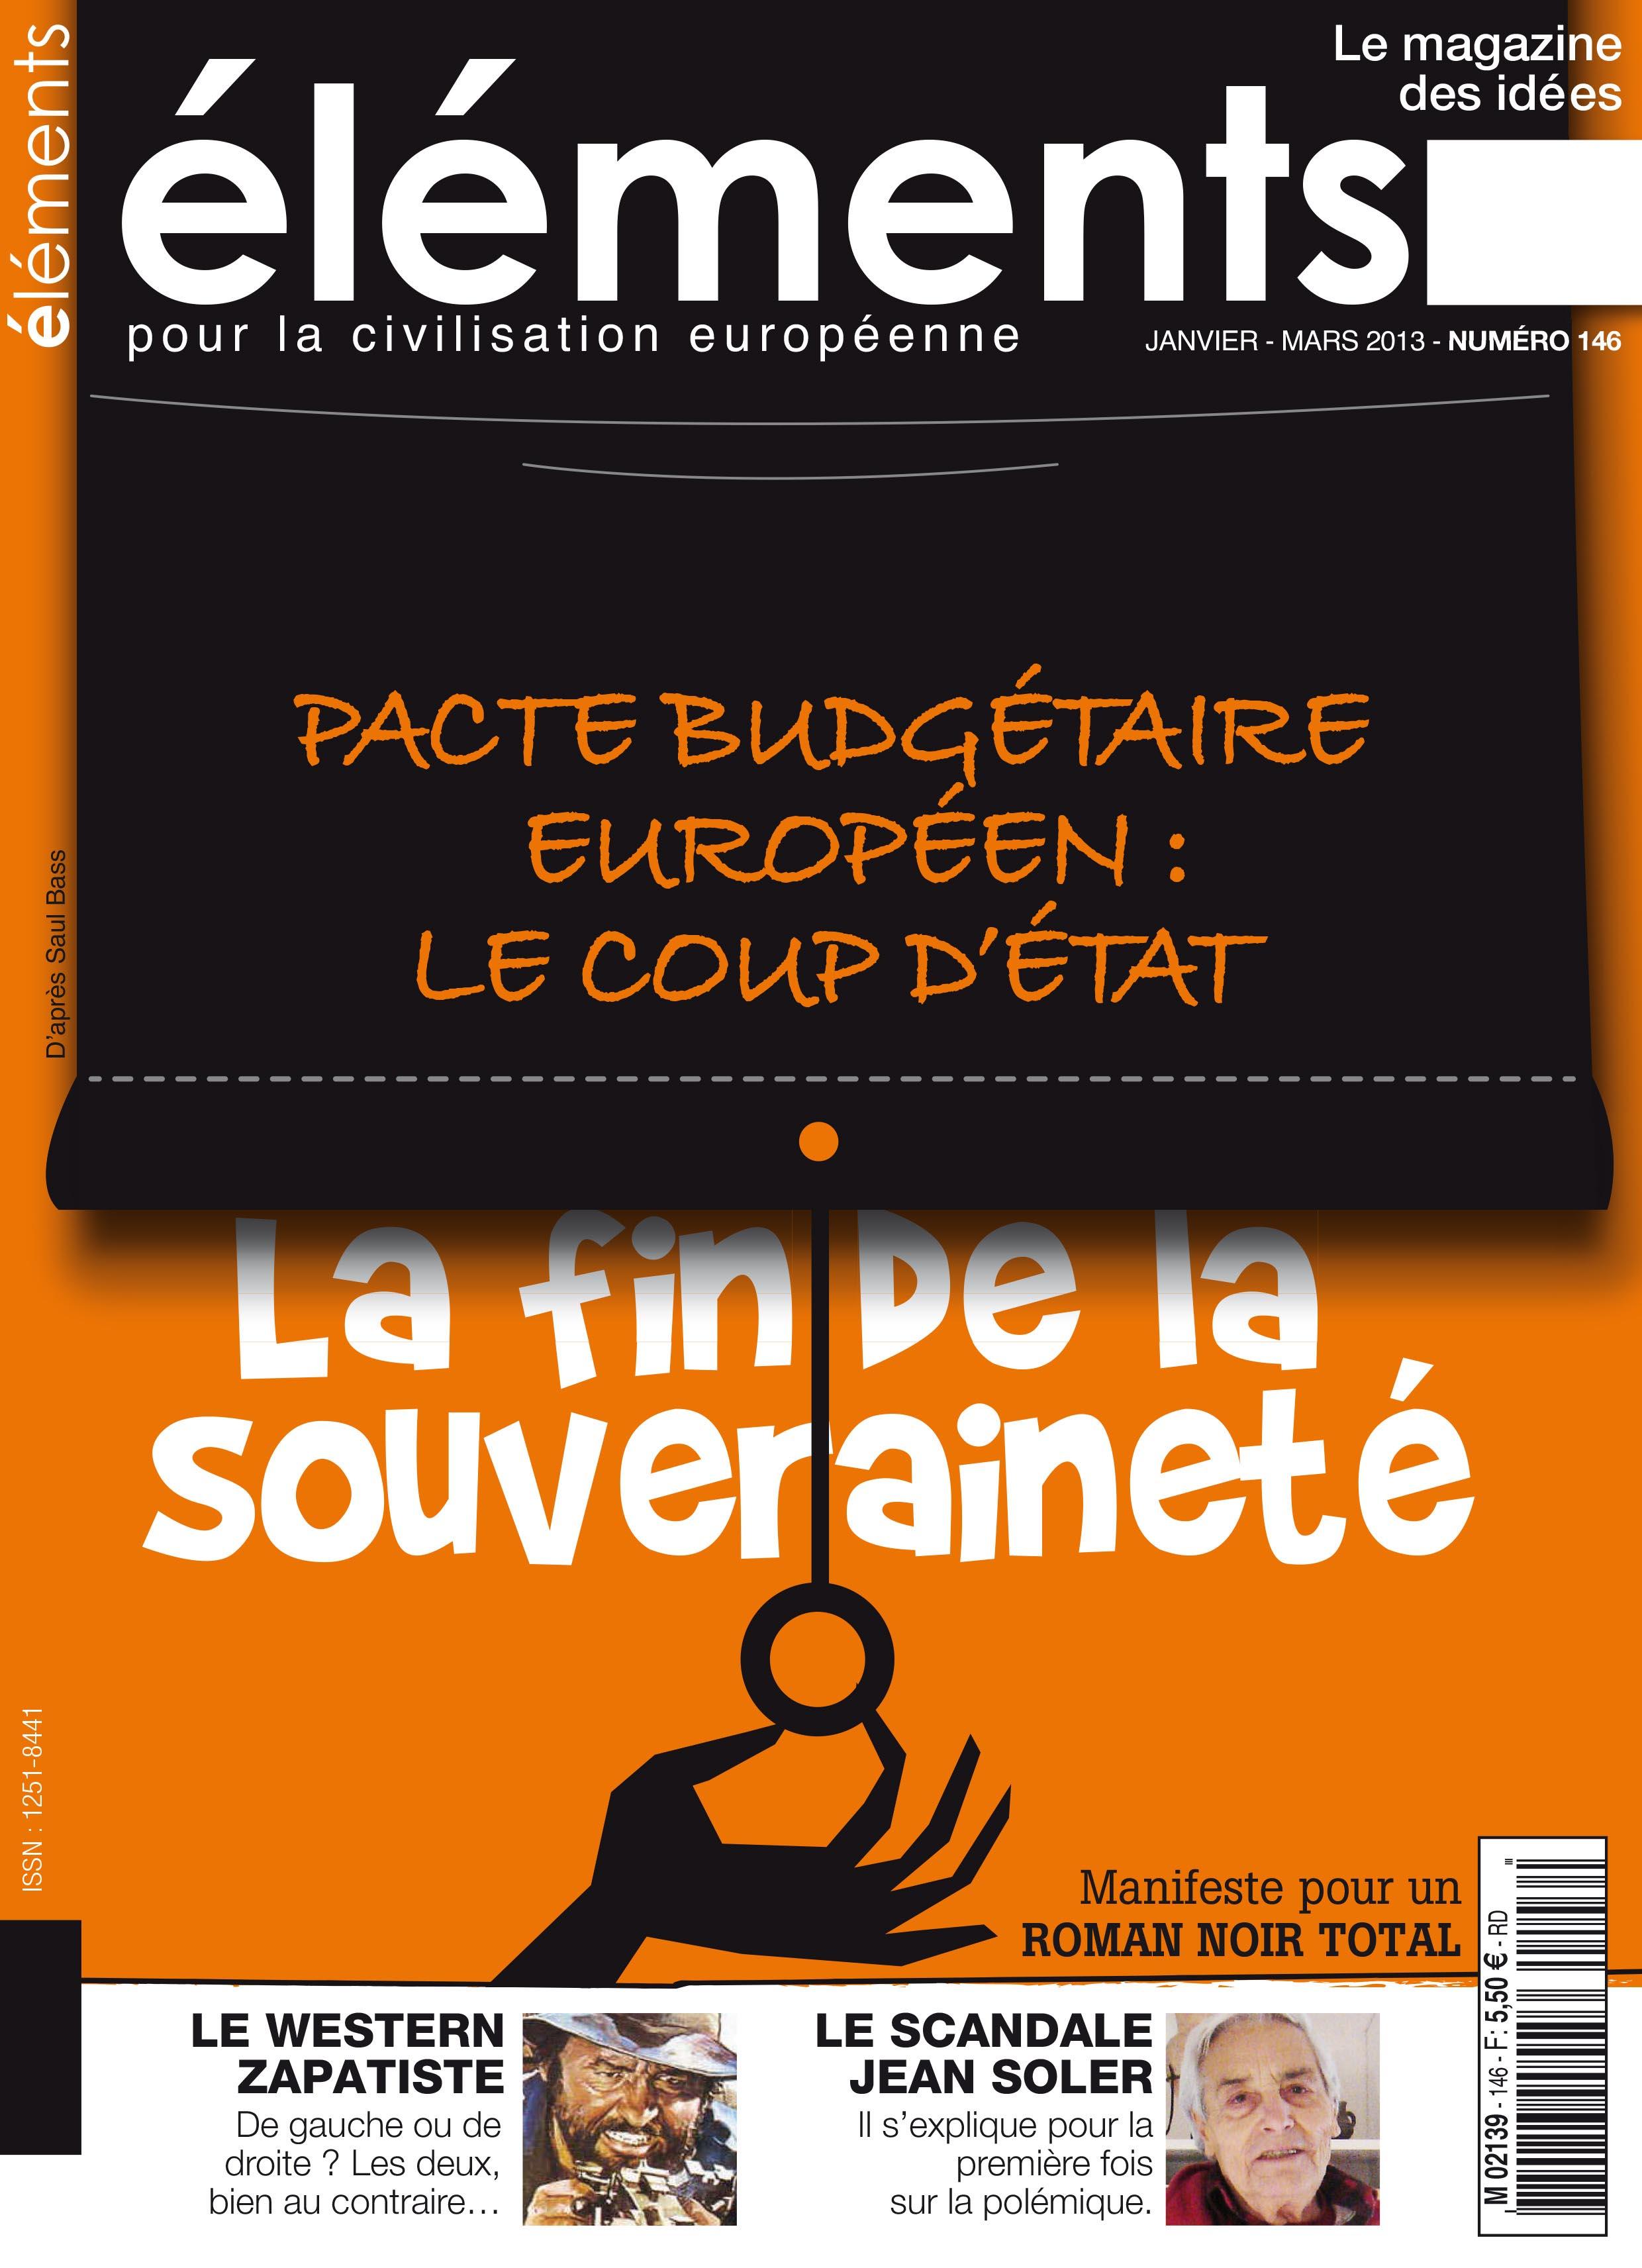 http://blogelements.typepad.fr/.a/6a0147e4419f47970b017c35c0ca81970b-pi